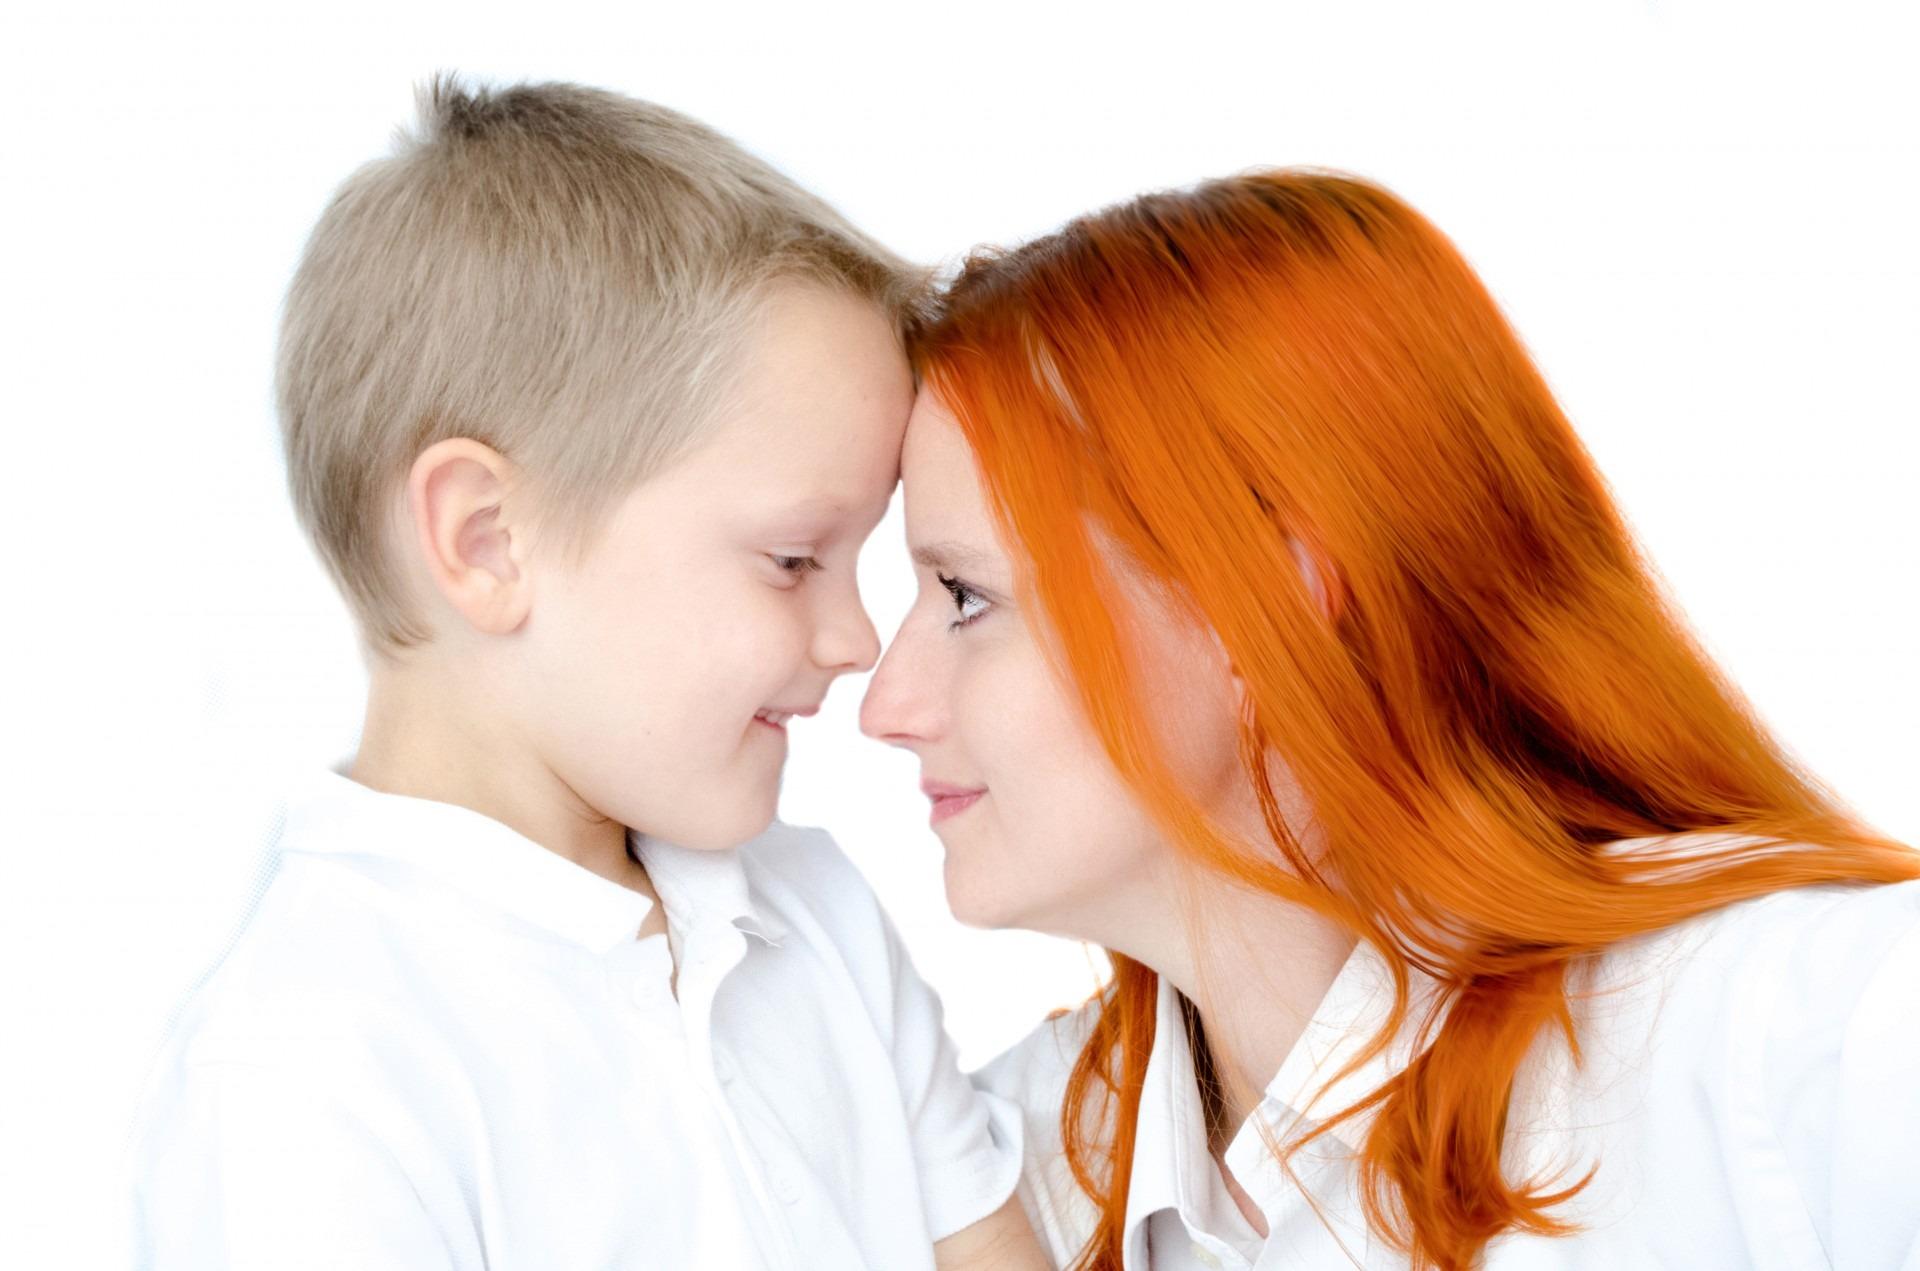 Син и мама сех 2 фотография